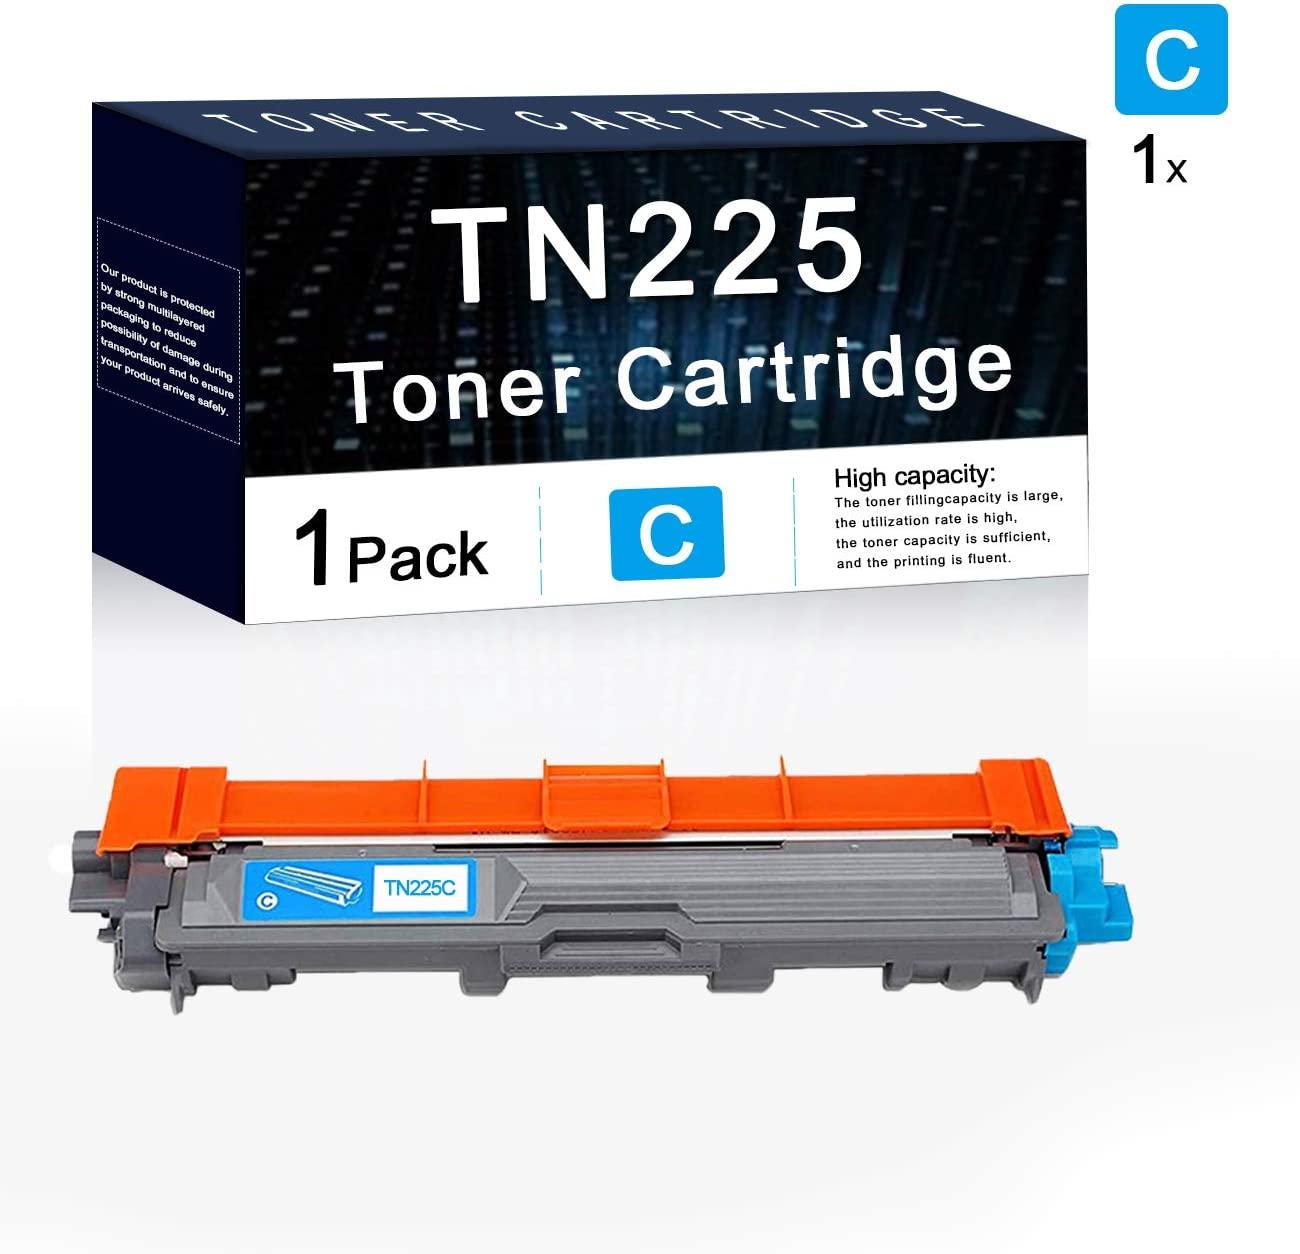 Compatible 1 Pack Cyan TN225 Toner Cartridge Used for Brother HL-3140CW HL-3150CDN HL-3170CDW HL-3180CDW MFC-9140CDN MFC-9340CDW DCP-9020CDN Printers